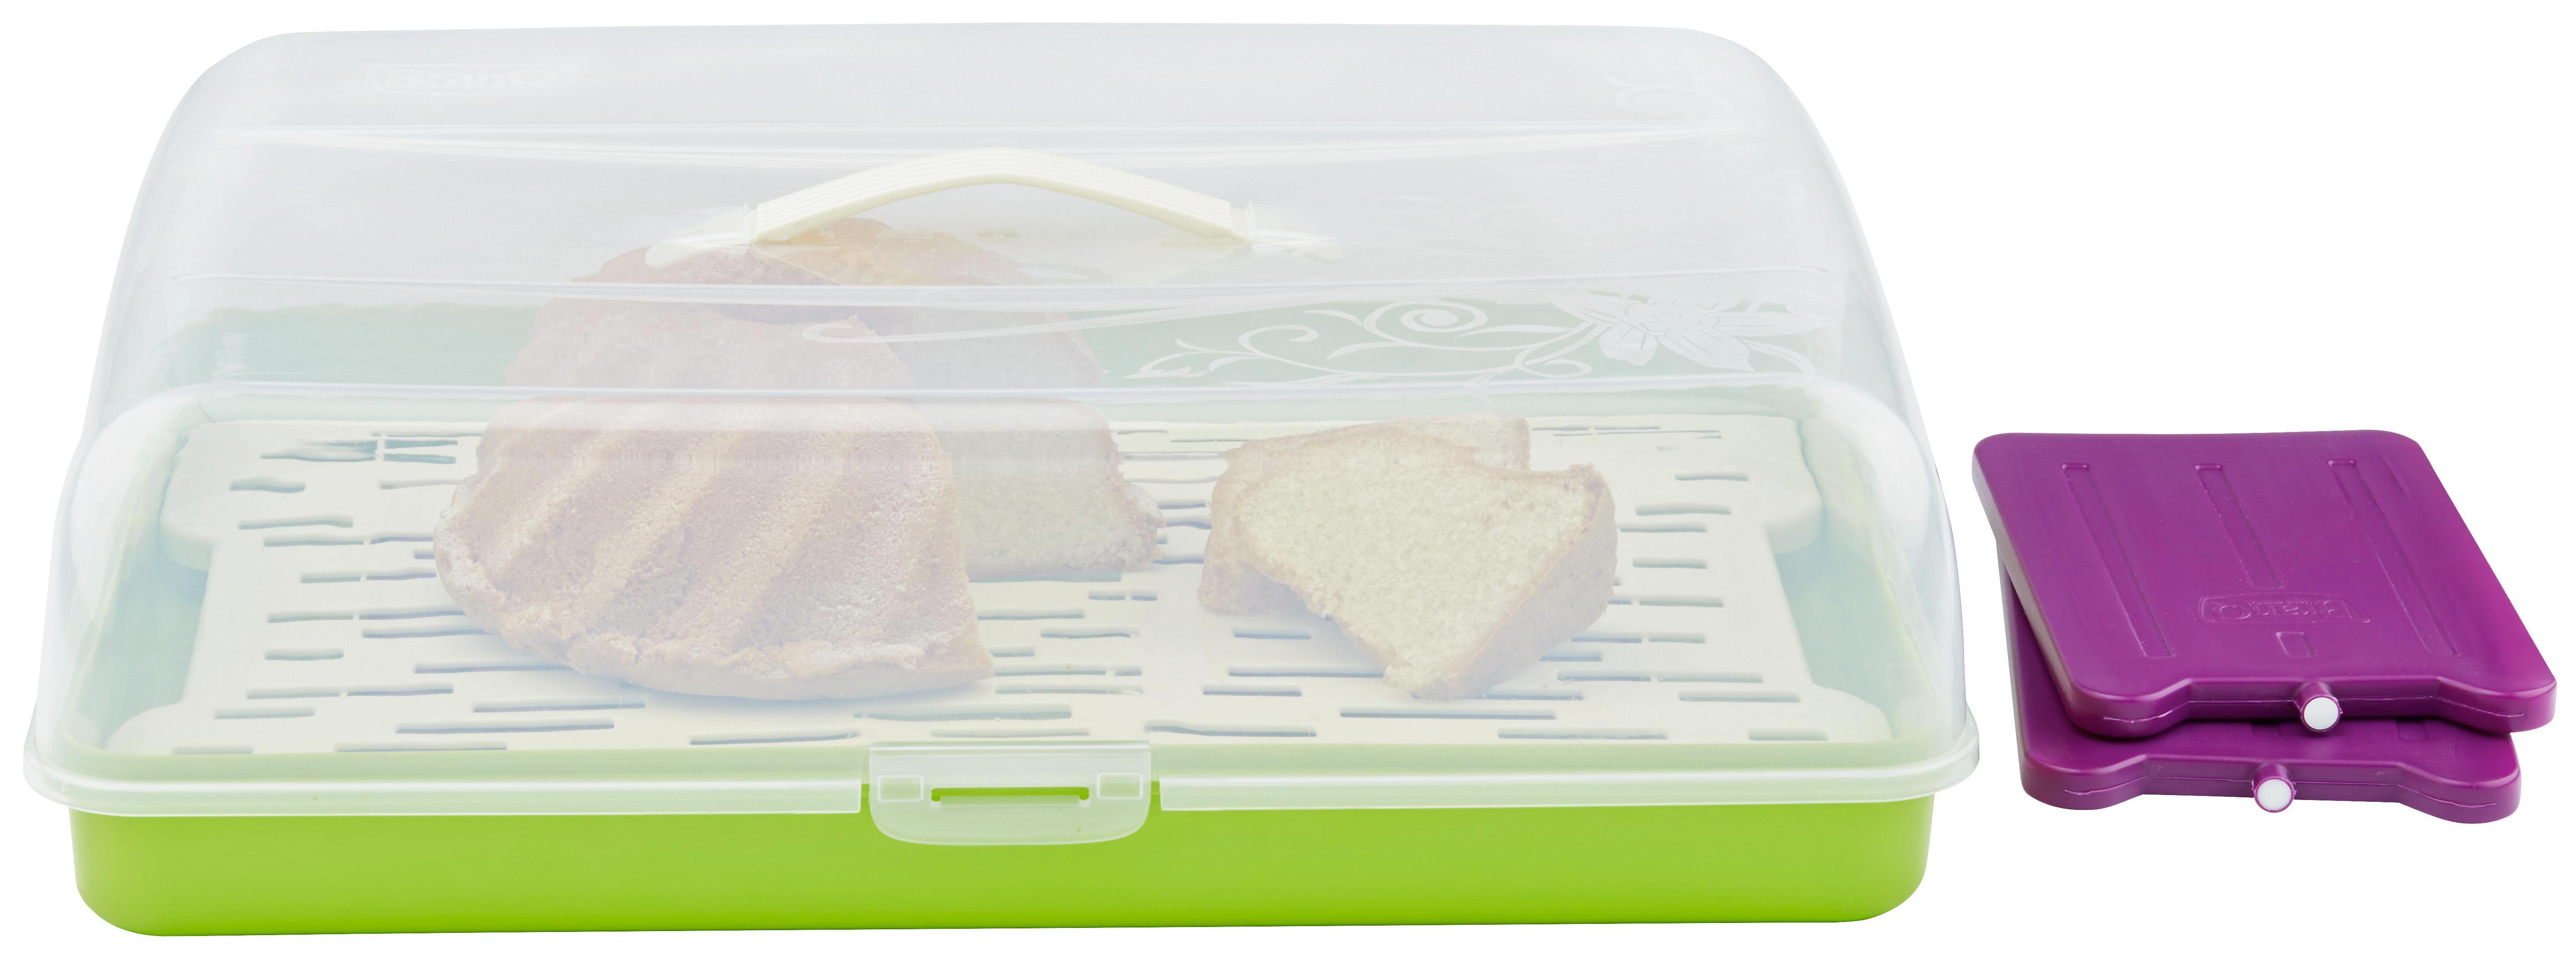 Kuchentransportbox Kimi - M. Kühlakku + Einsatz - Transparent/Lila, Kunststoff (42/29/12,5cm) - MÖMAX modern living